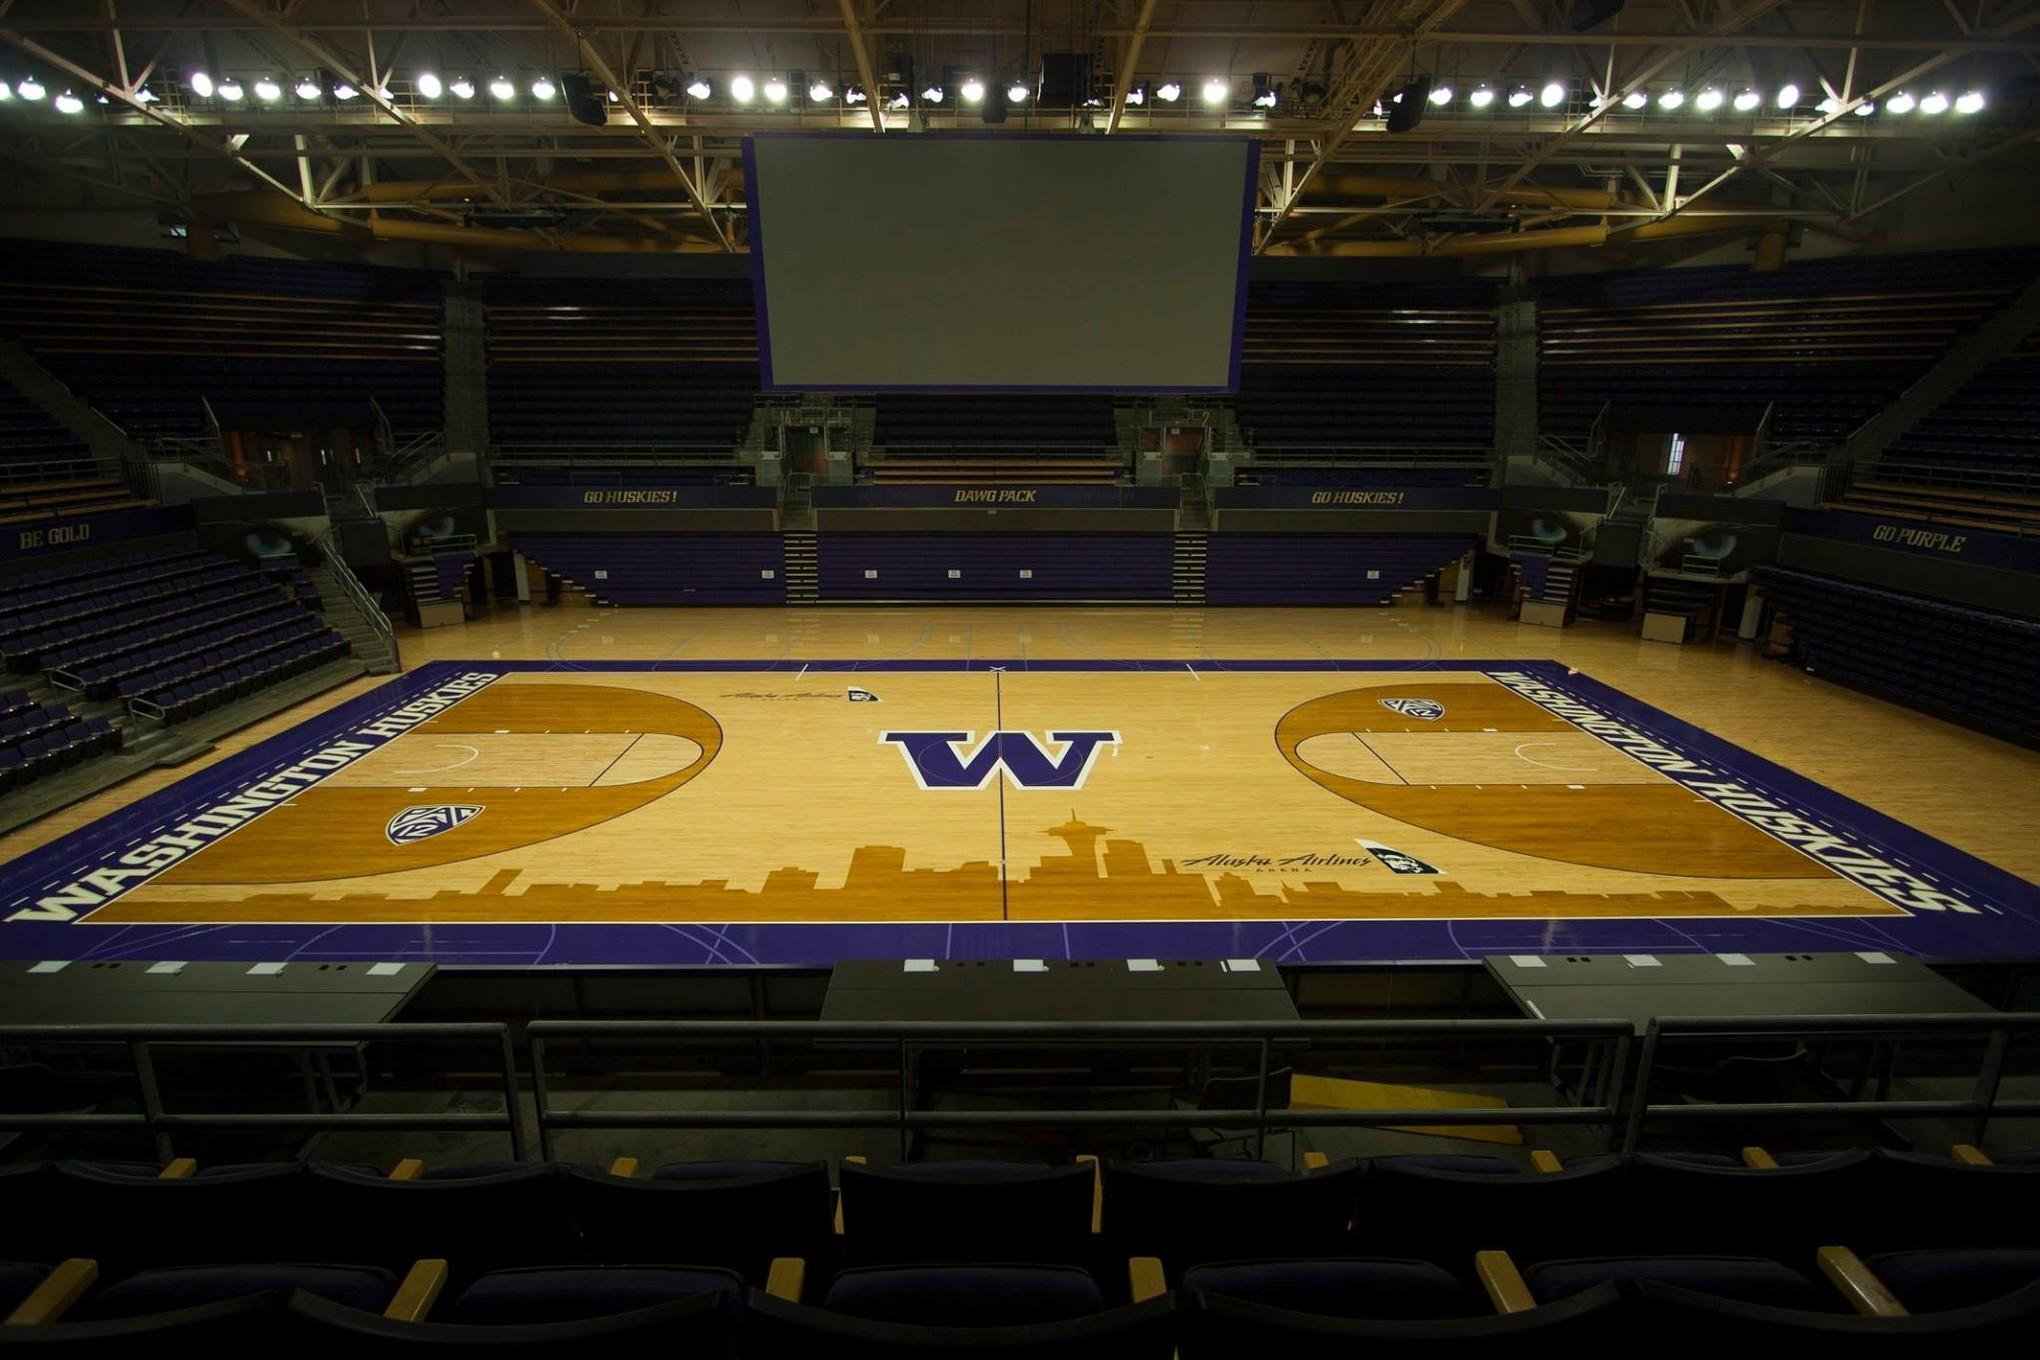 Uw_new_basketball_court_hec_ed_medium